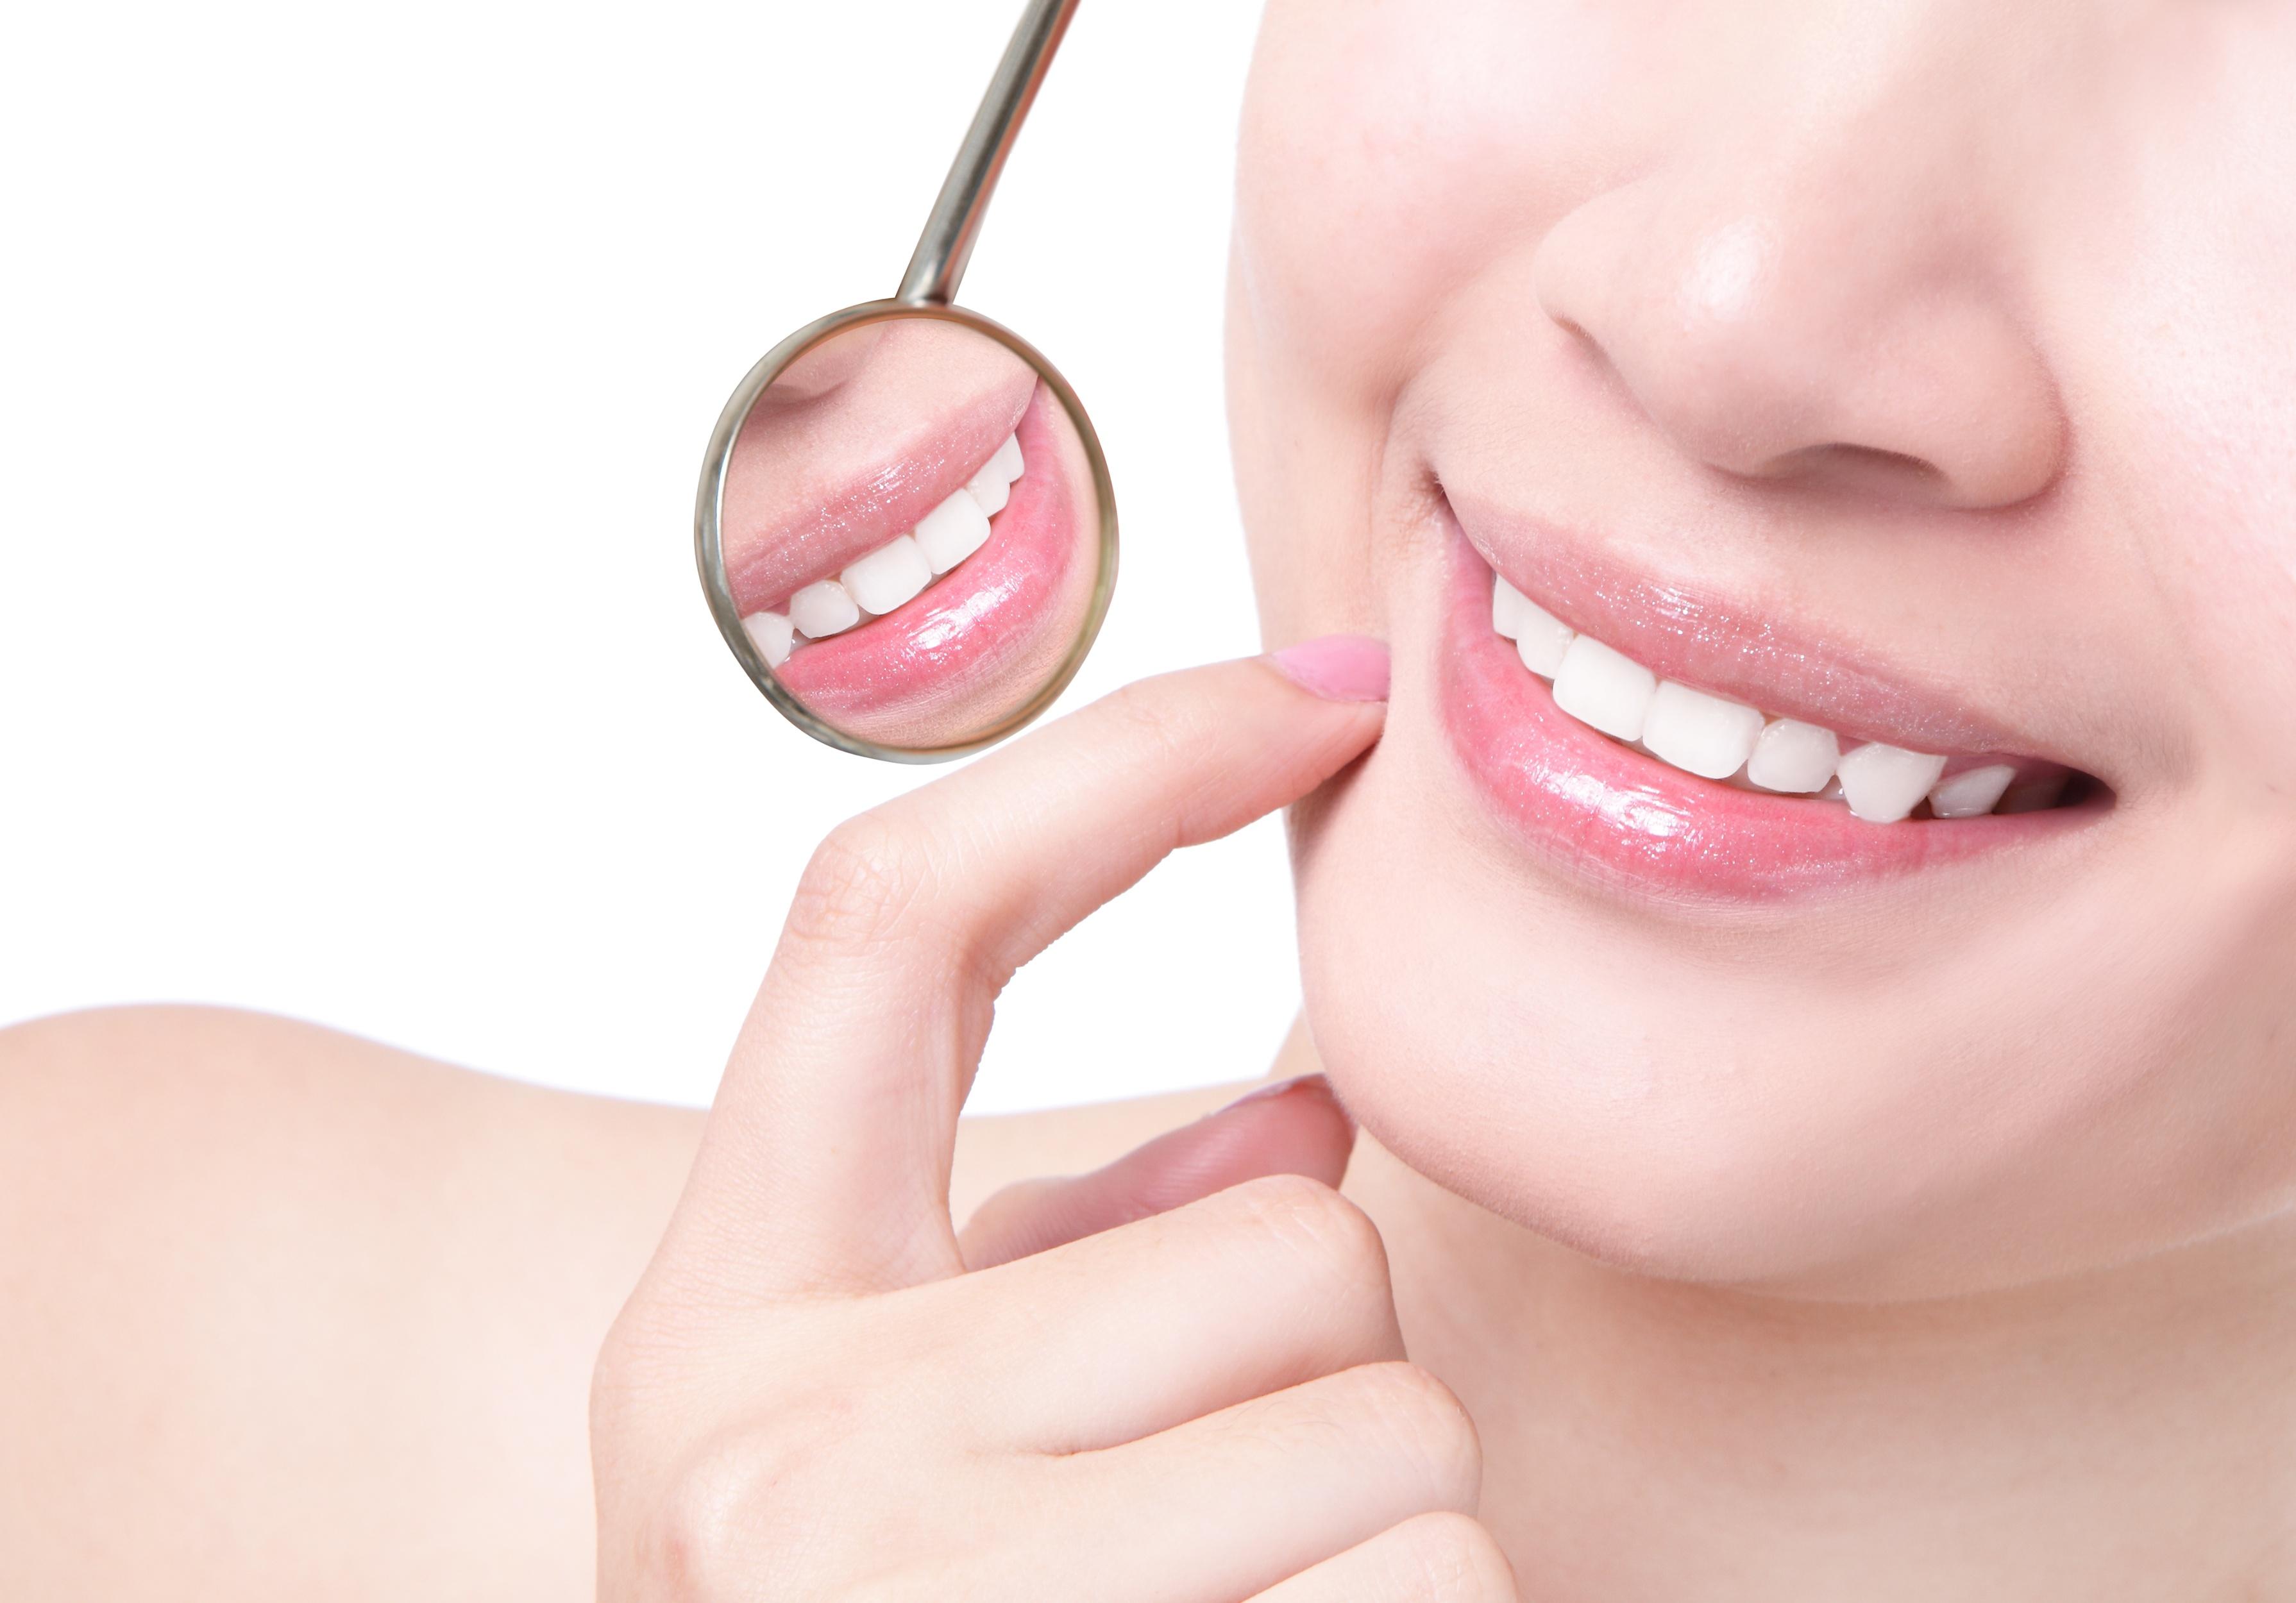 Gramercy Park Teeth Bleaching